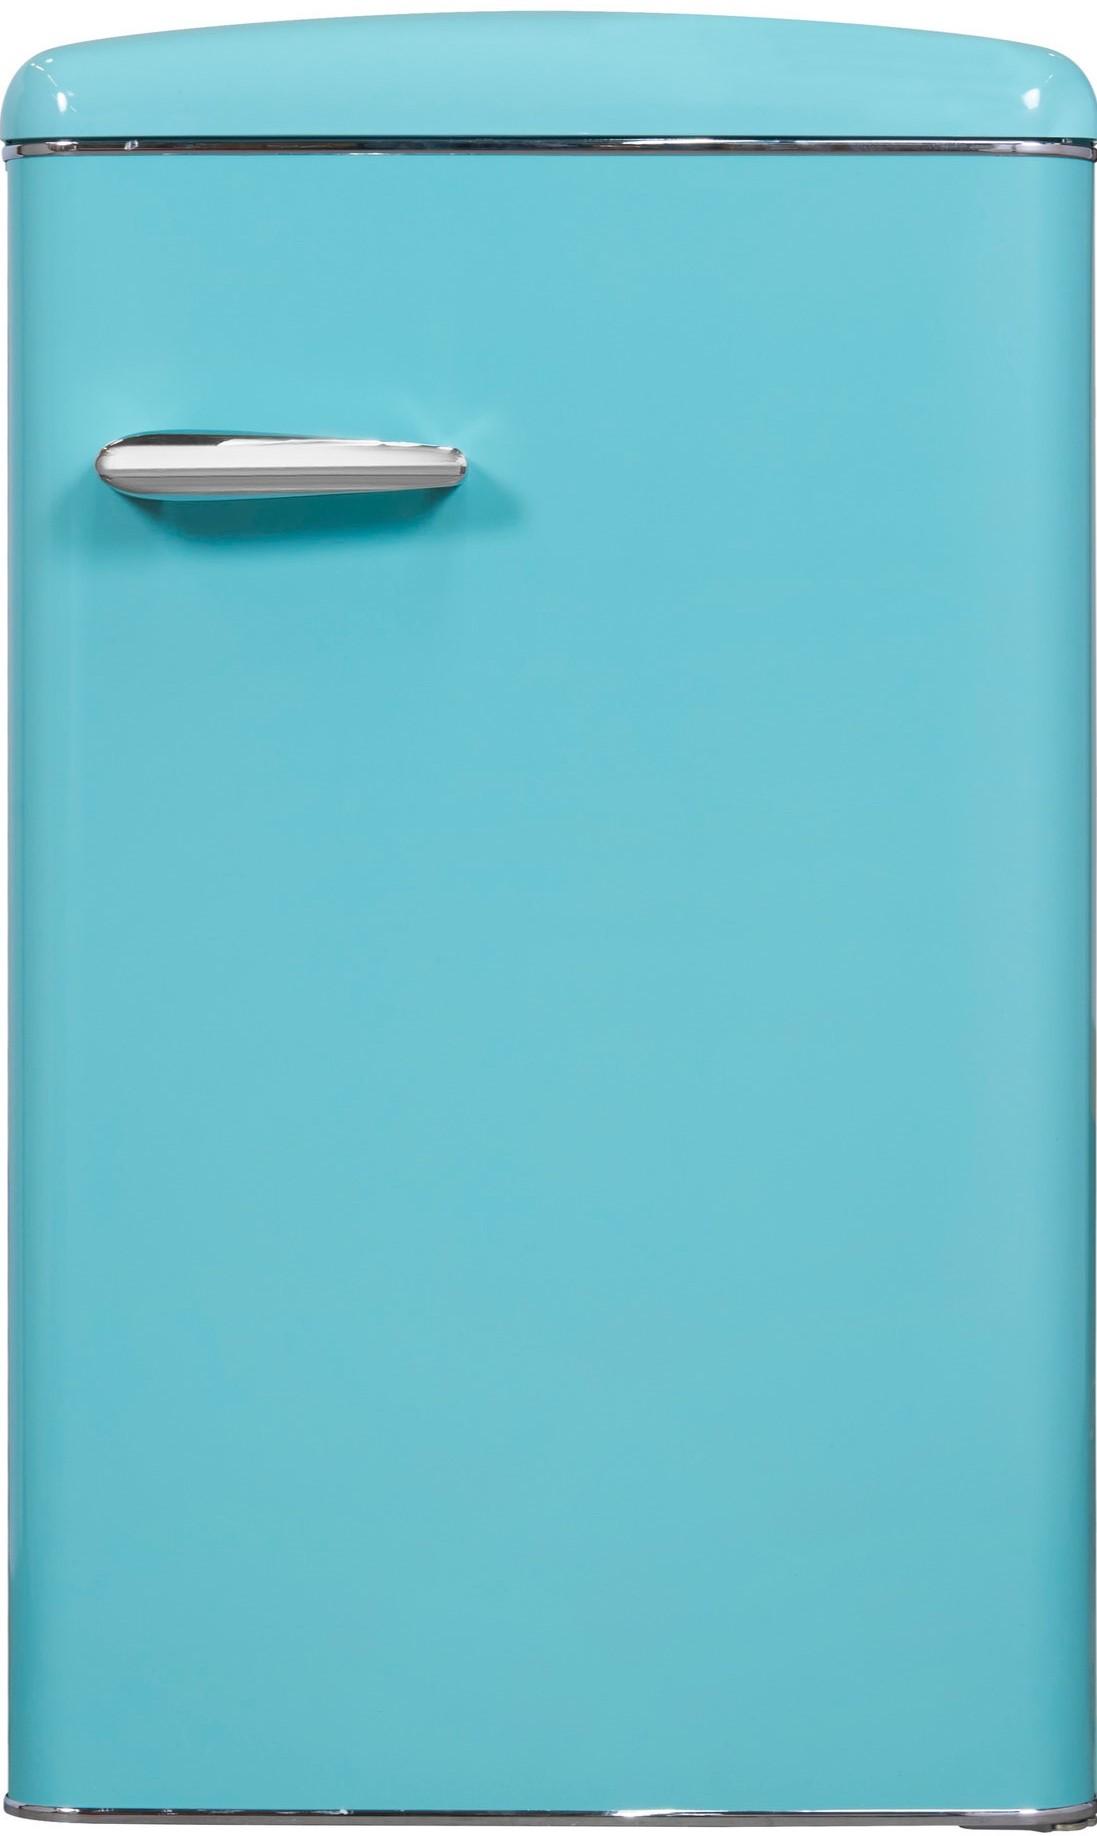 Retrostyle Kühlschrank türkisblau